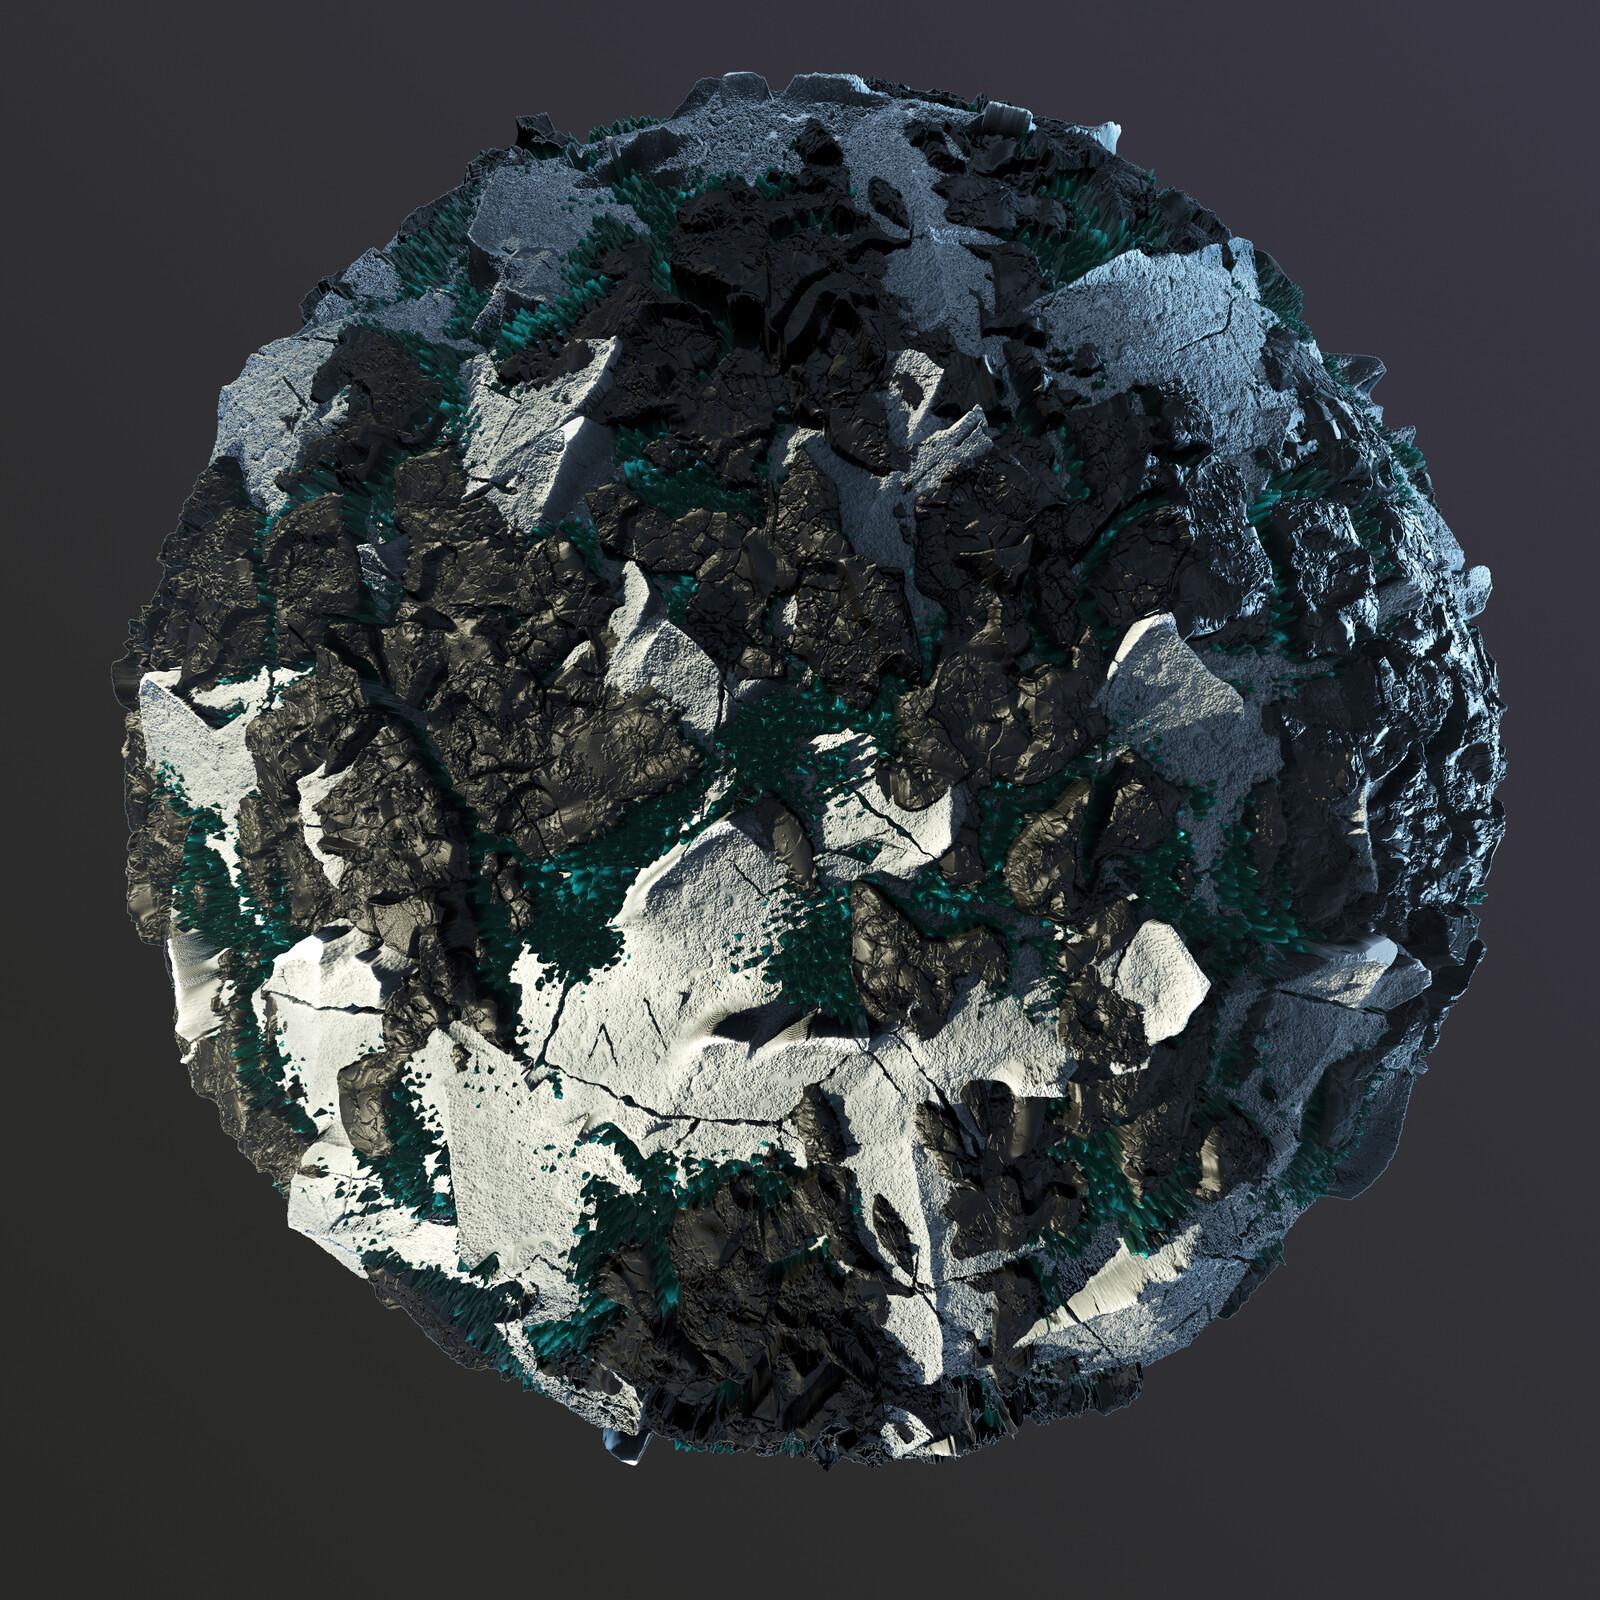 MechroMancy Terrain Material